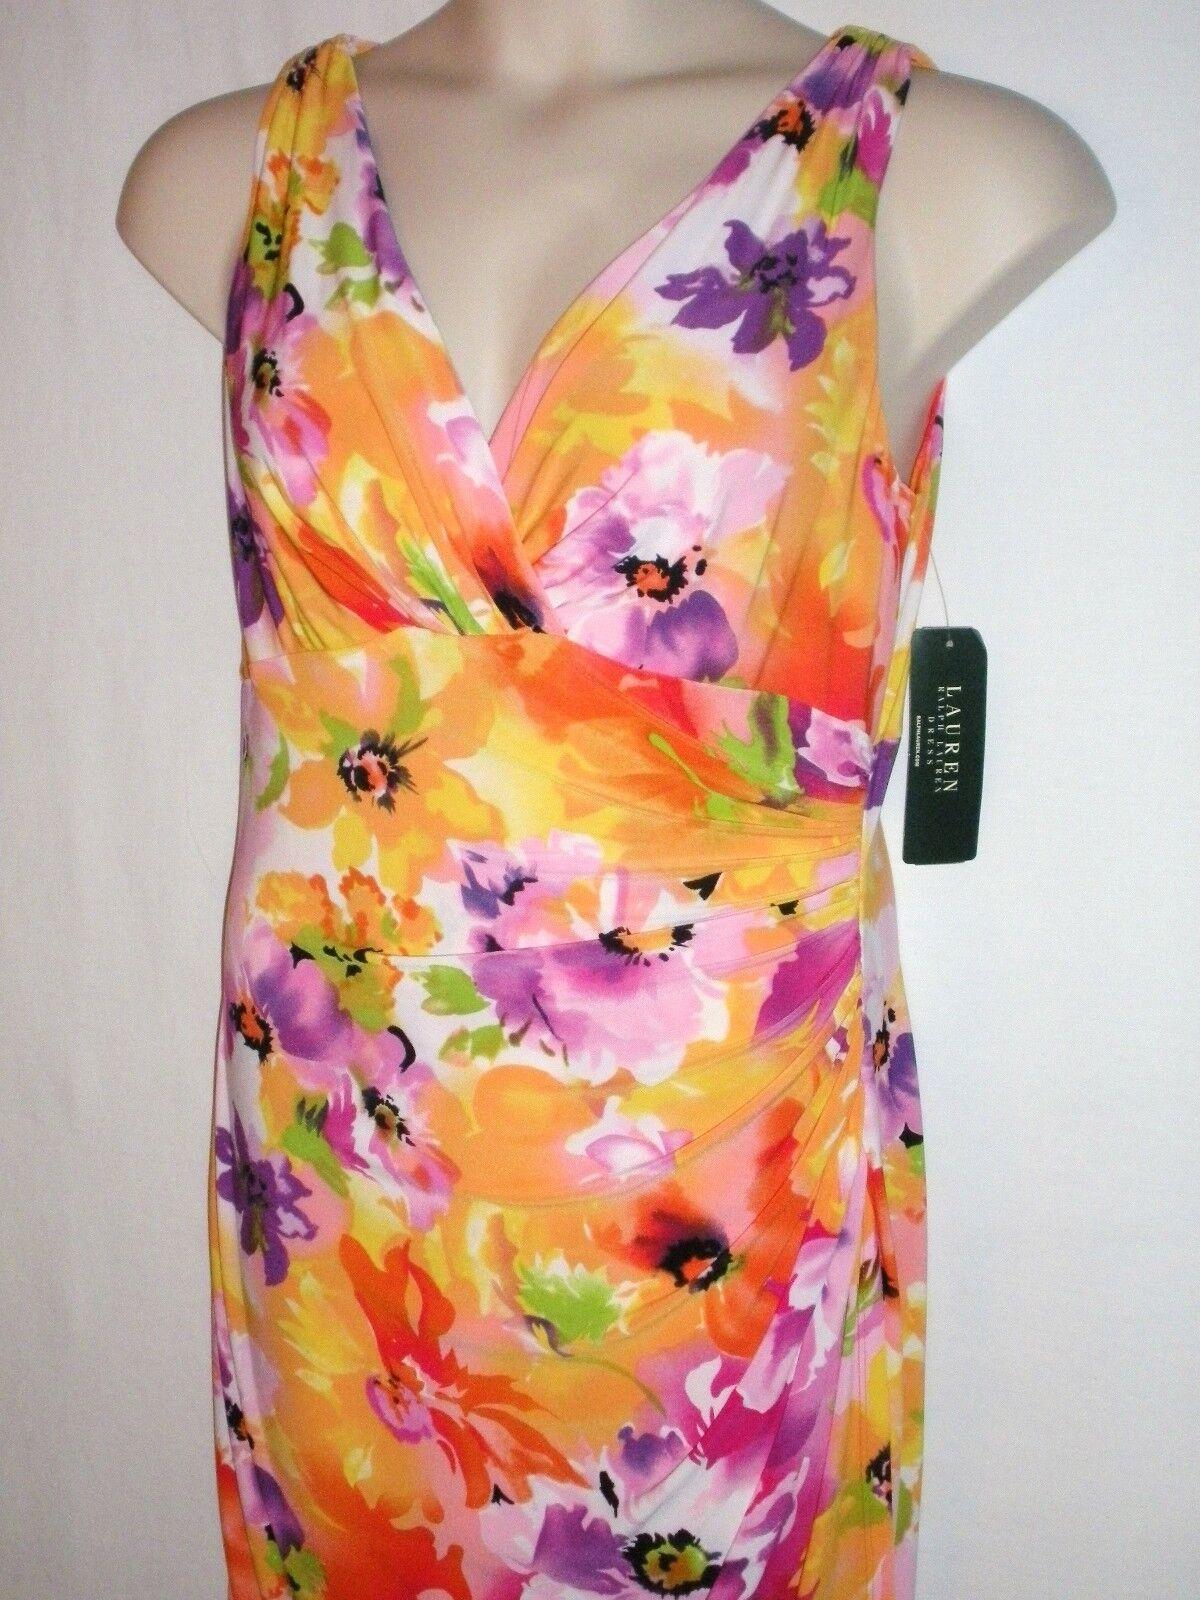 NWT LAUREN RALPH LAUREN Women's Spring Floral Dress, Multi Coral, Size 10,